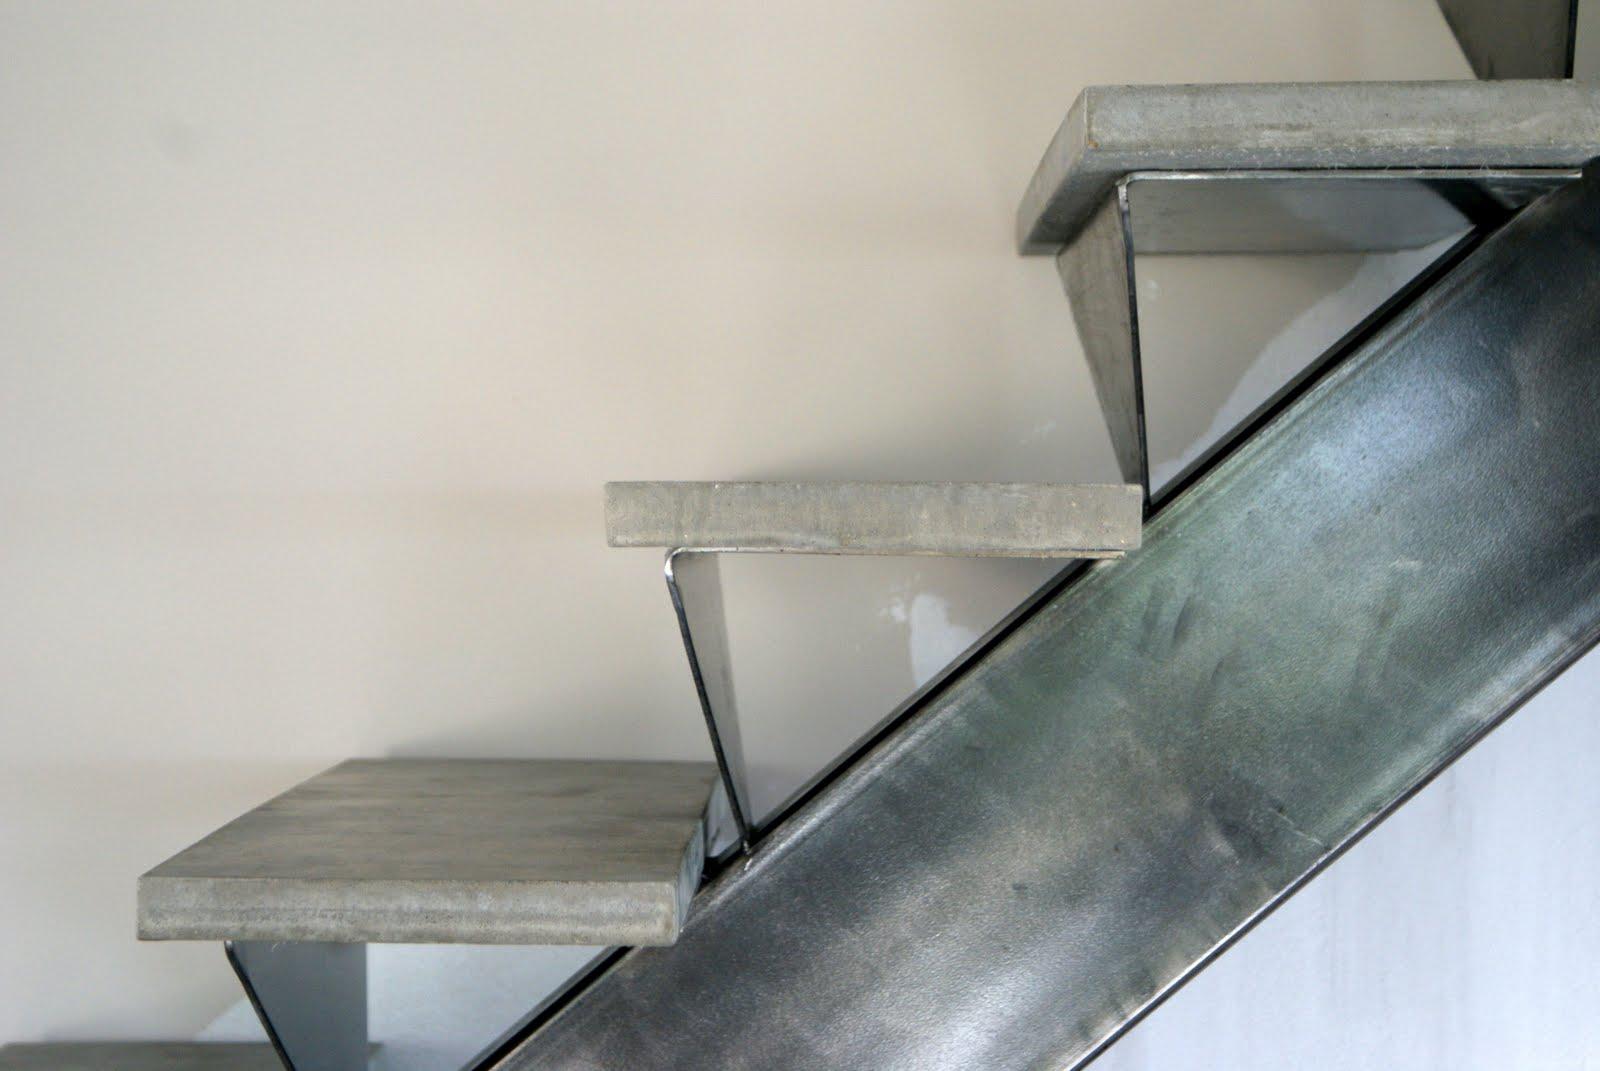 escalier pas cher. Black Bedroom Furniture Sets. Home Design Ideas